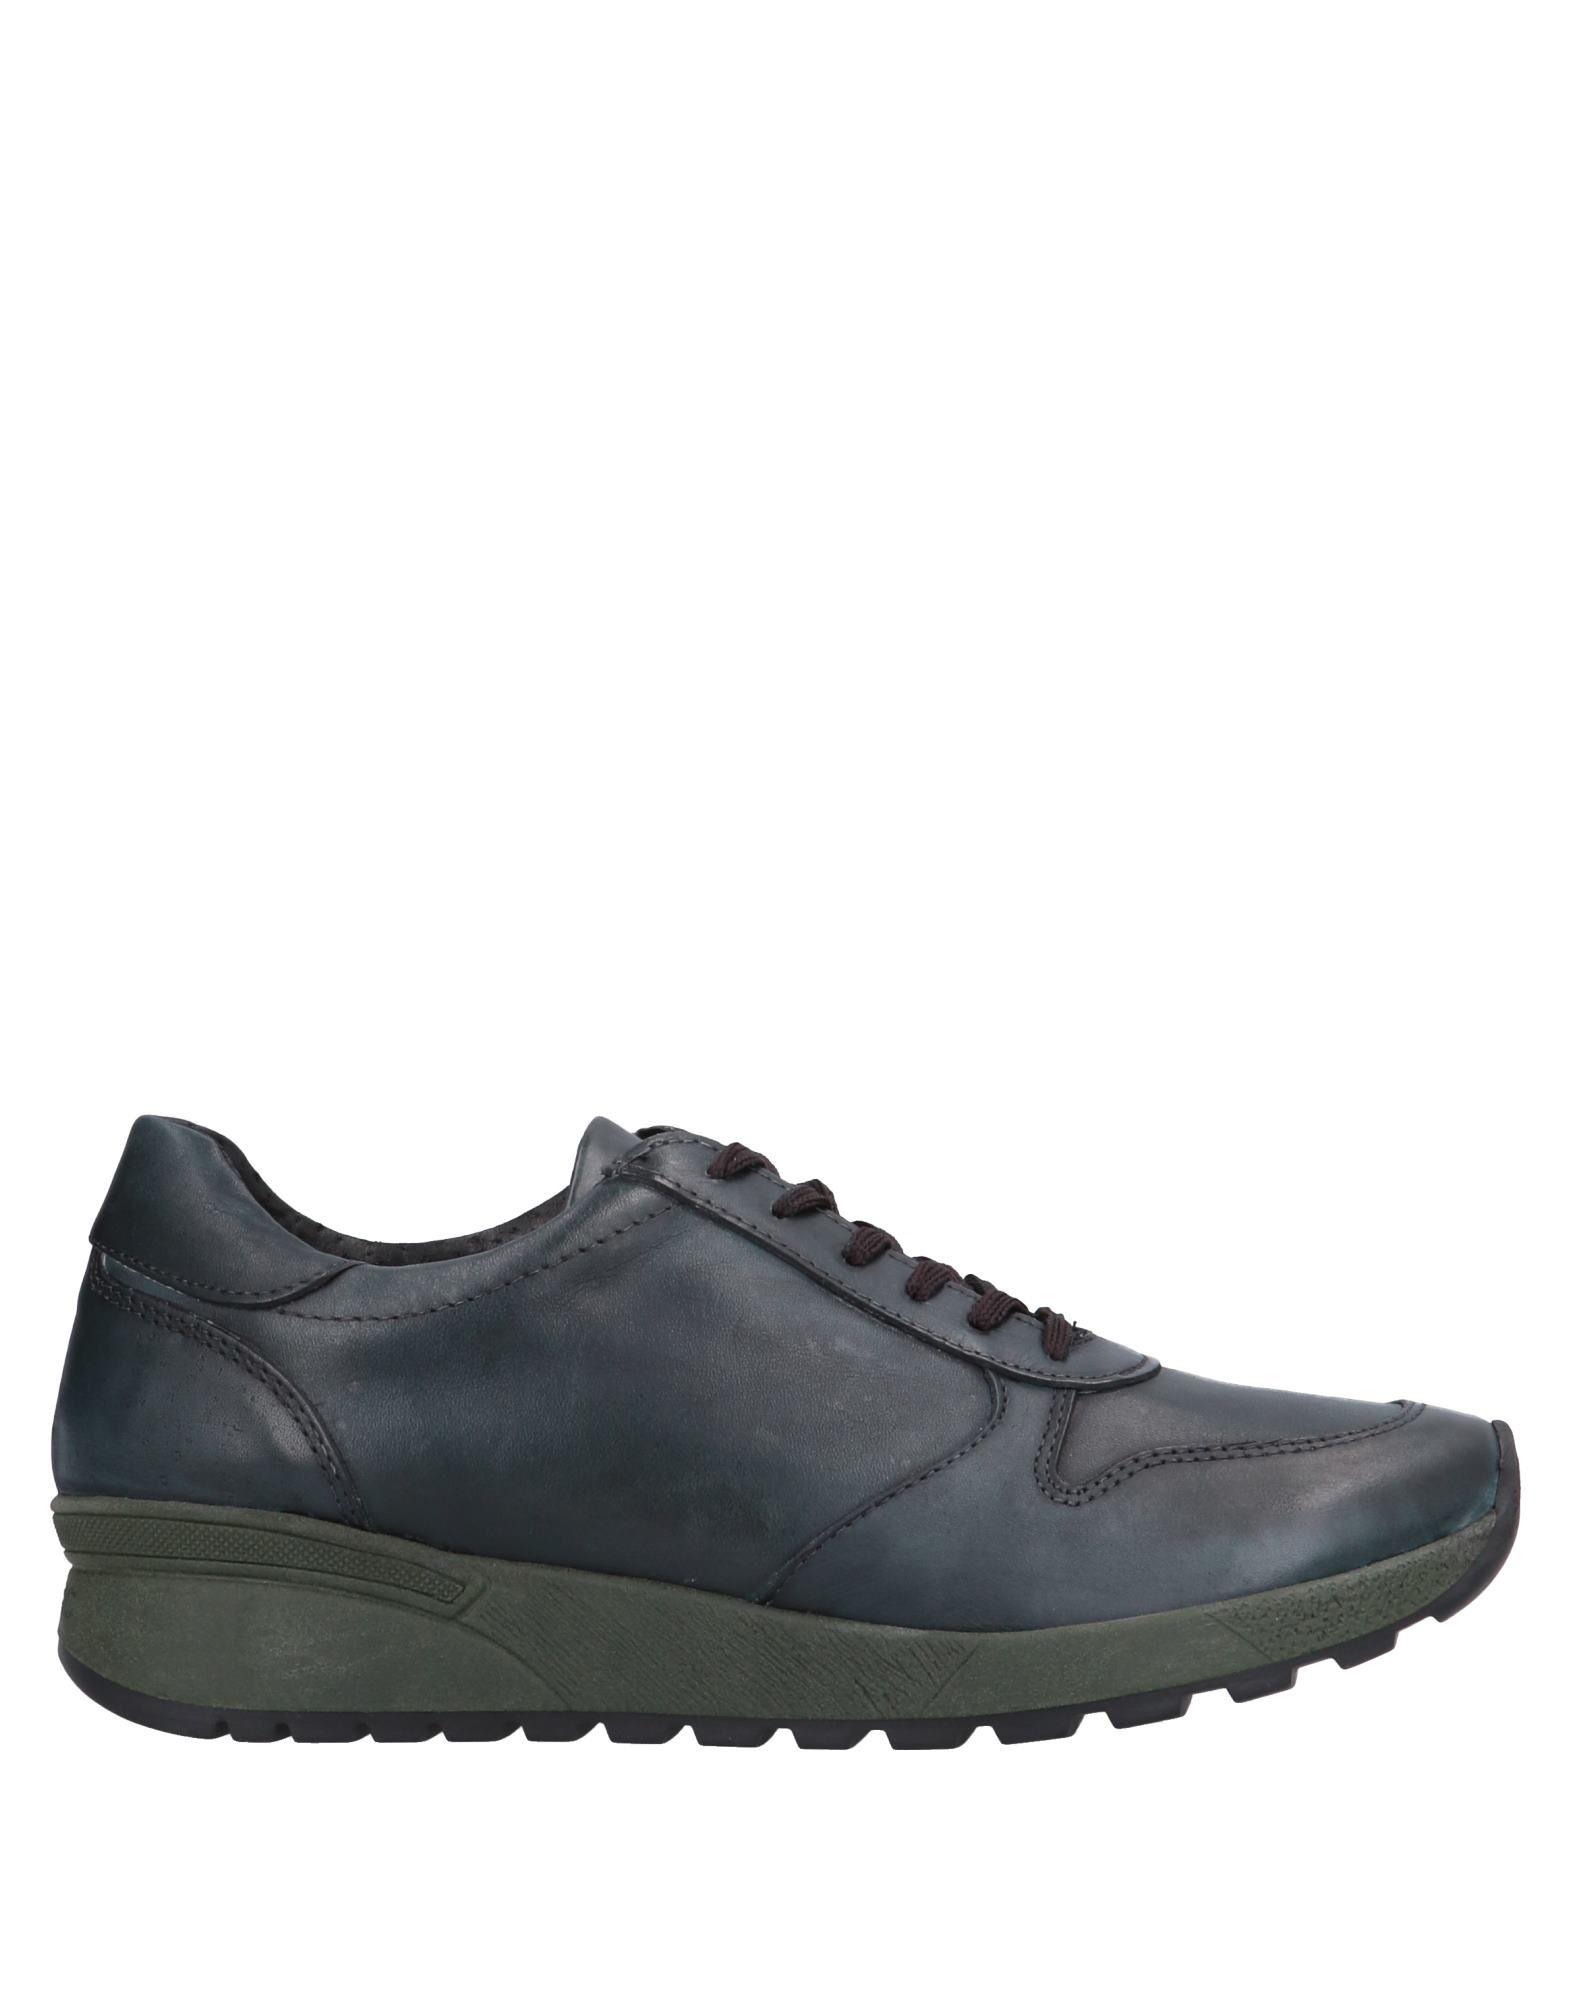 Zapatillas oscuro Historic Hombre - Zapatillas Historic  Verde oscuro Zapatillas 91fa84